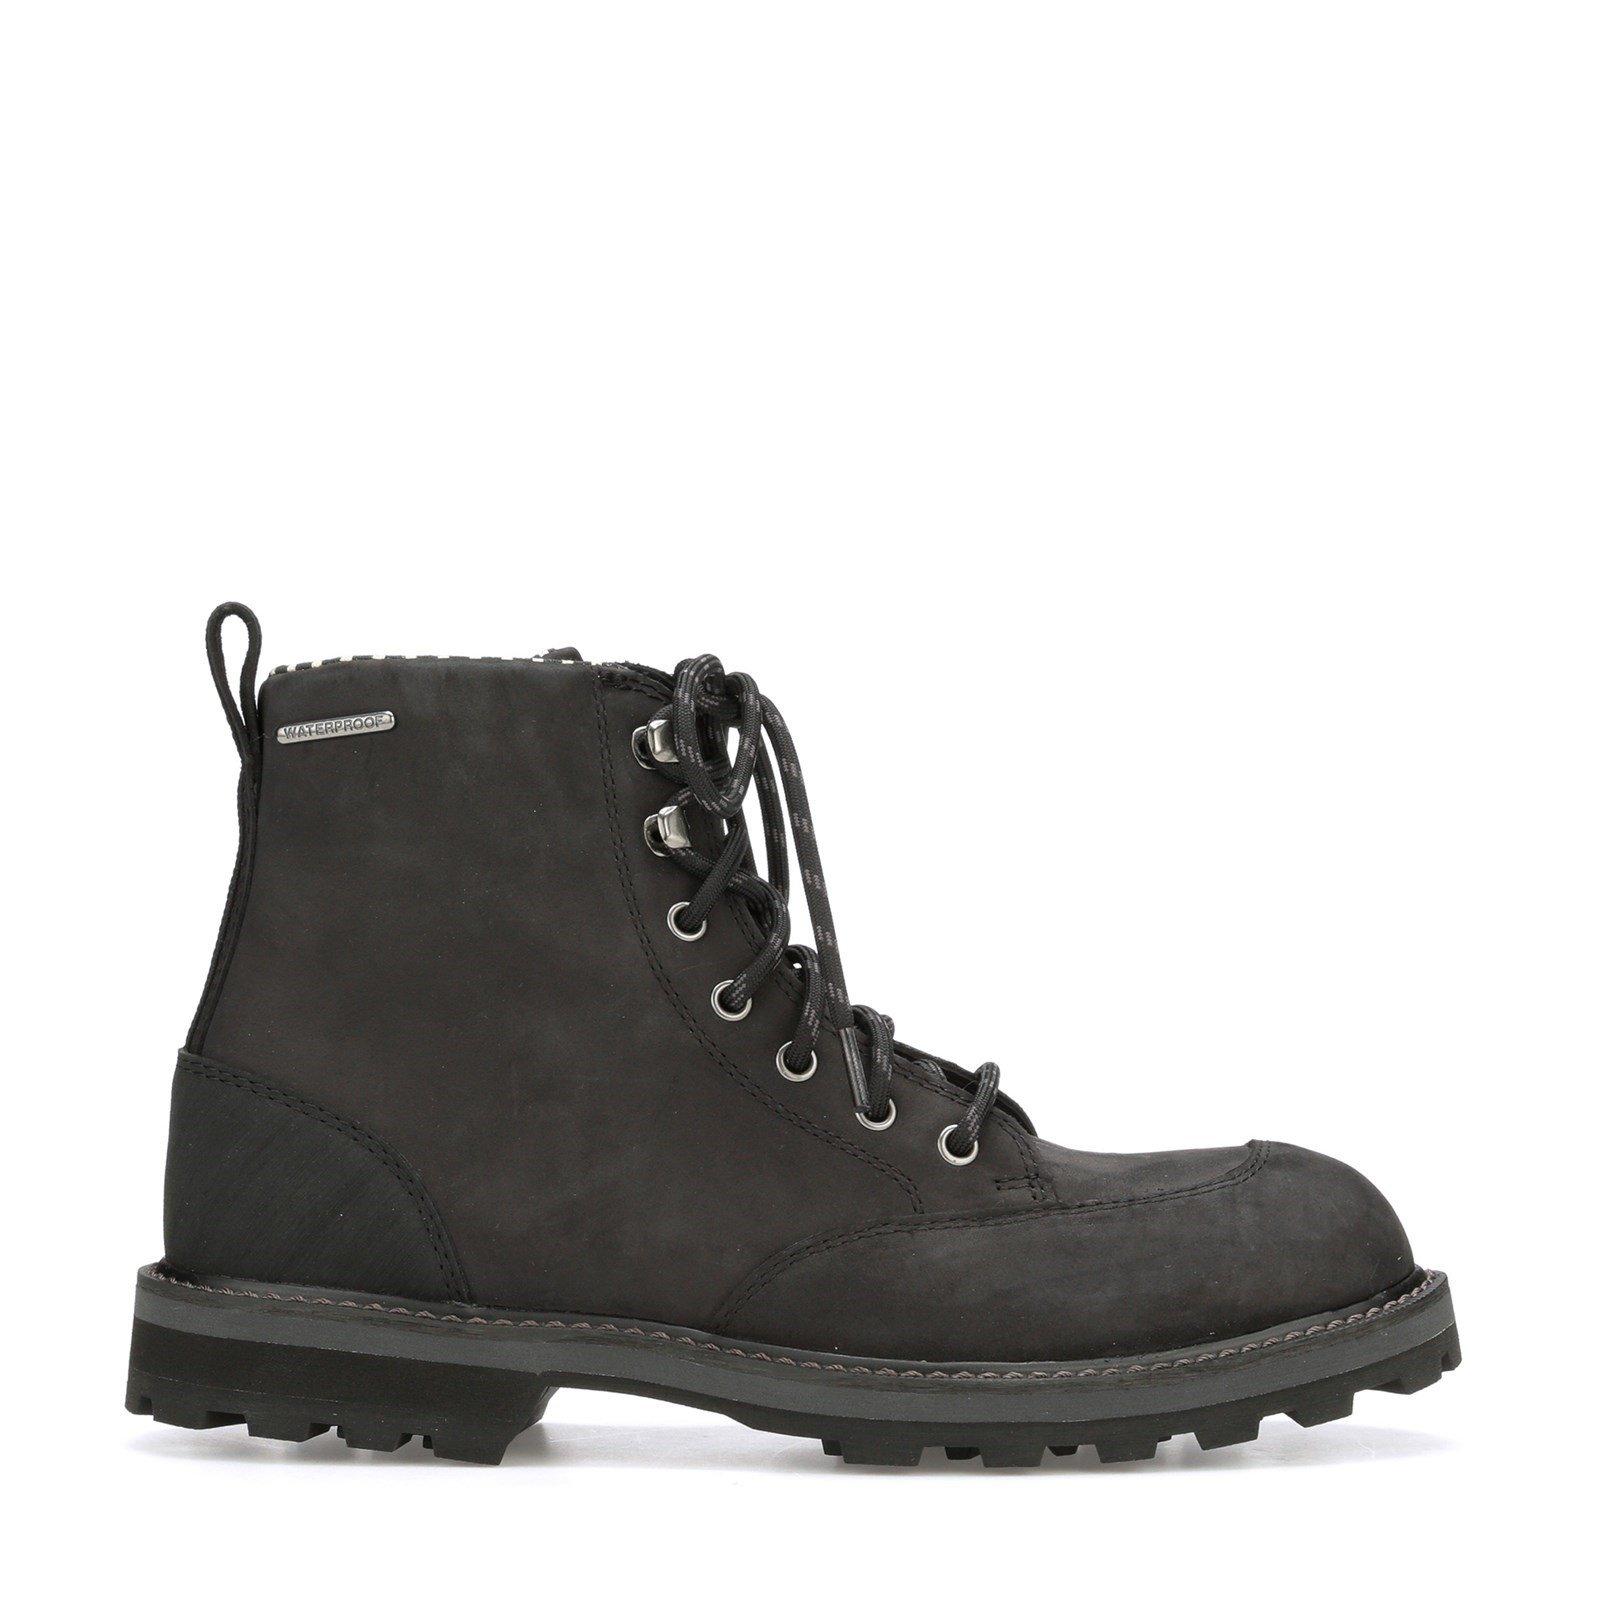 Muck Boots Men's Foreman Boot Black 31854 - Black 9.5